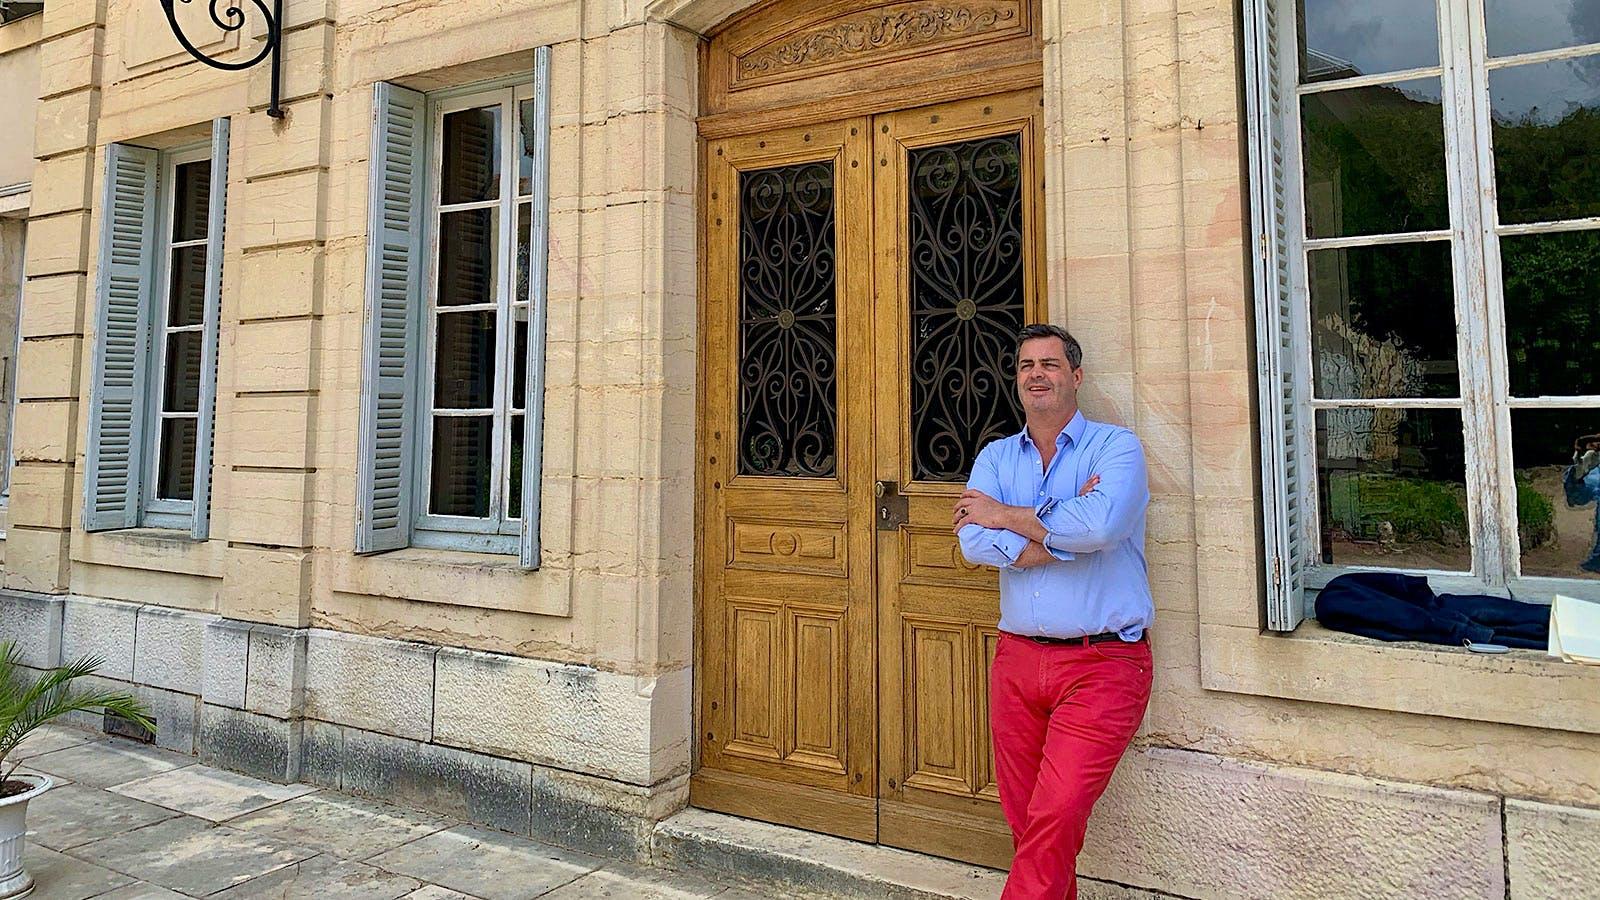 The Man Waking Up Burgundy's Elite